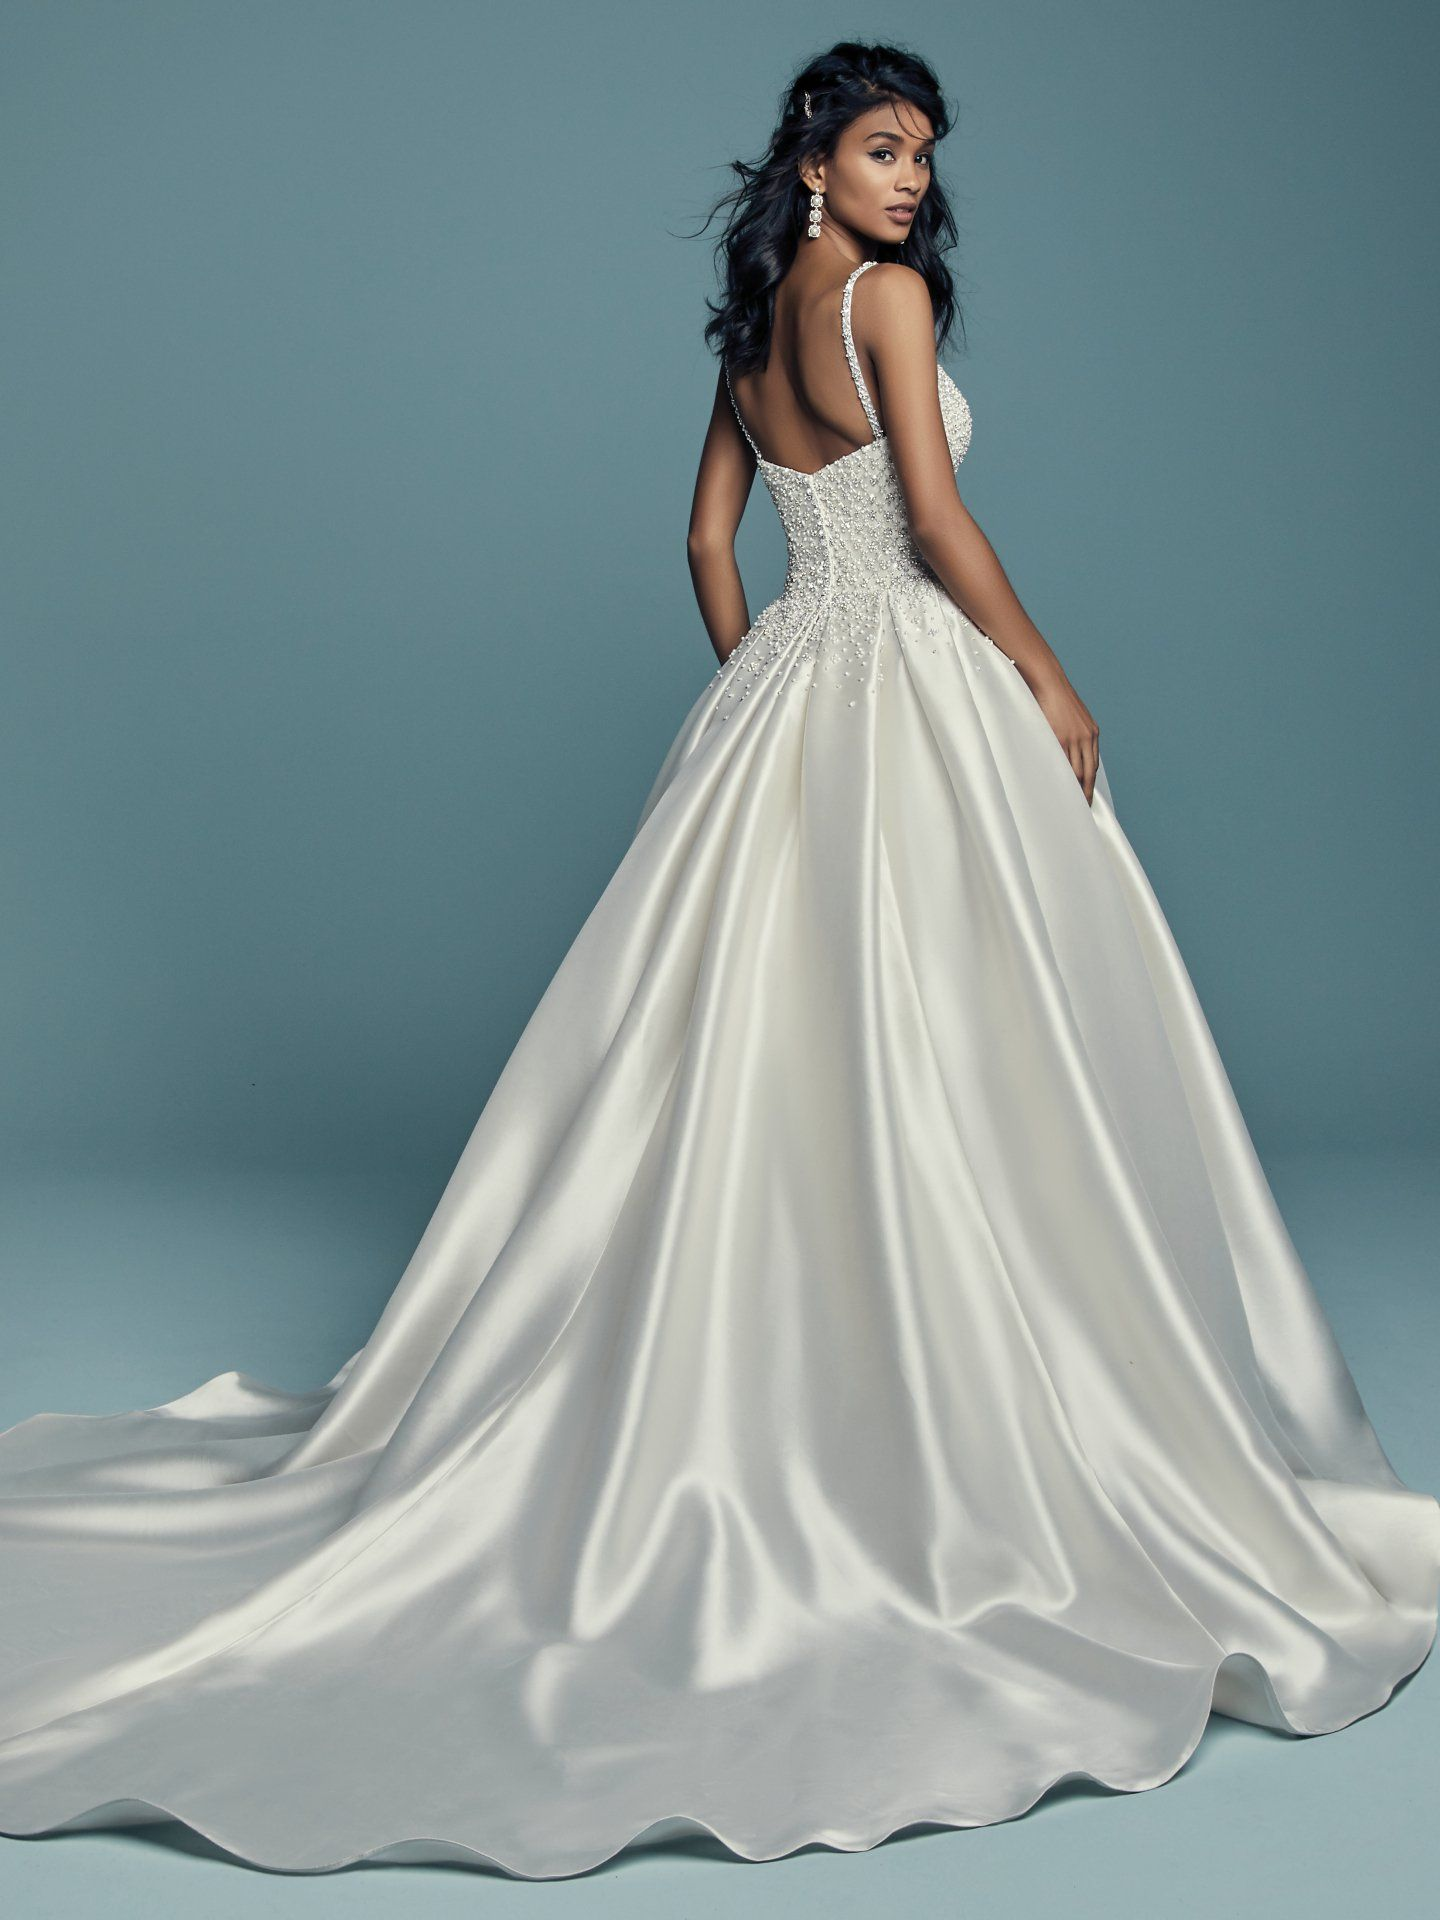 Maggie Sottero Dana Maggie sottero wedding dresses